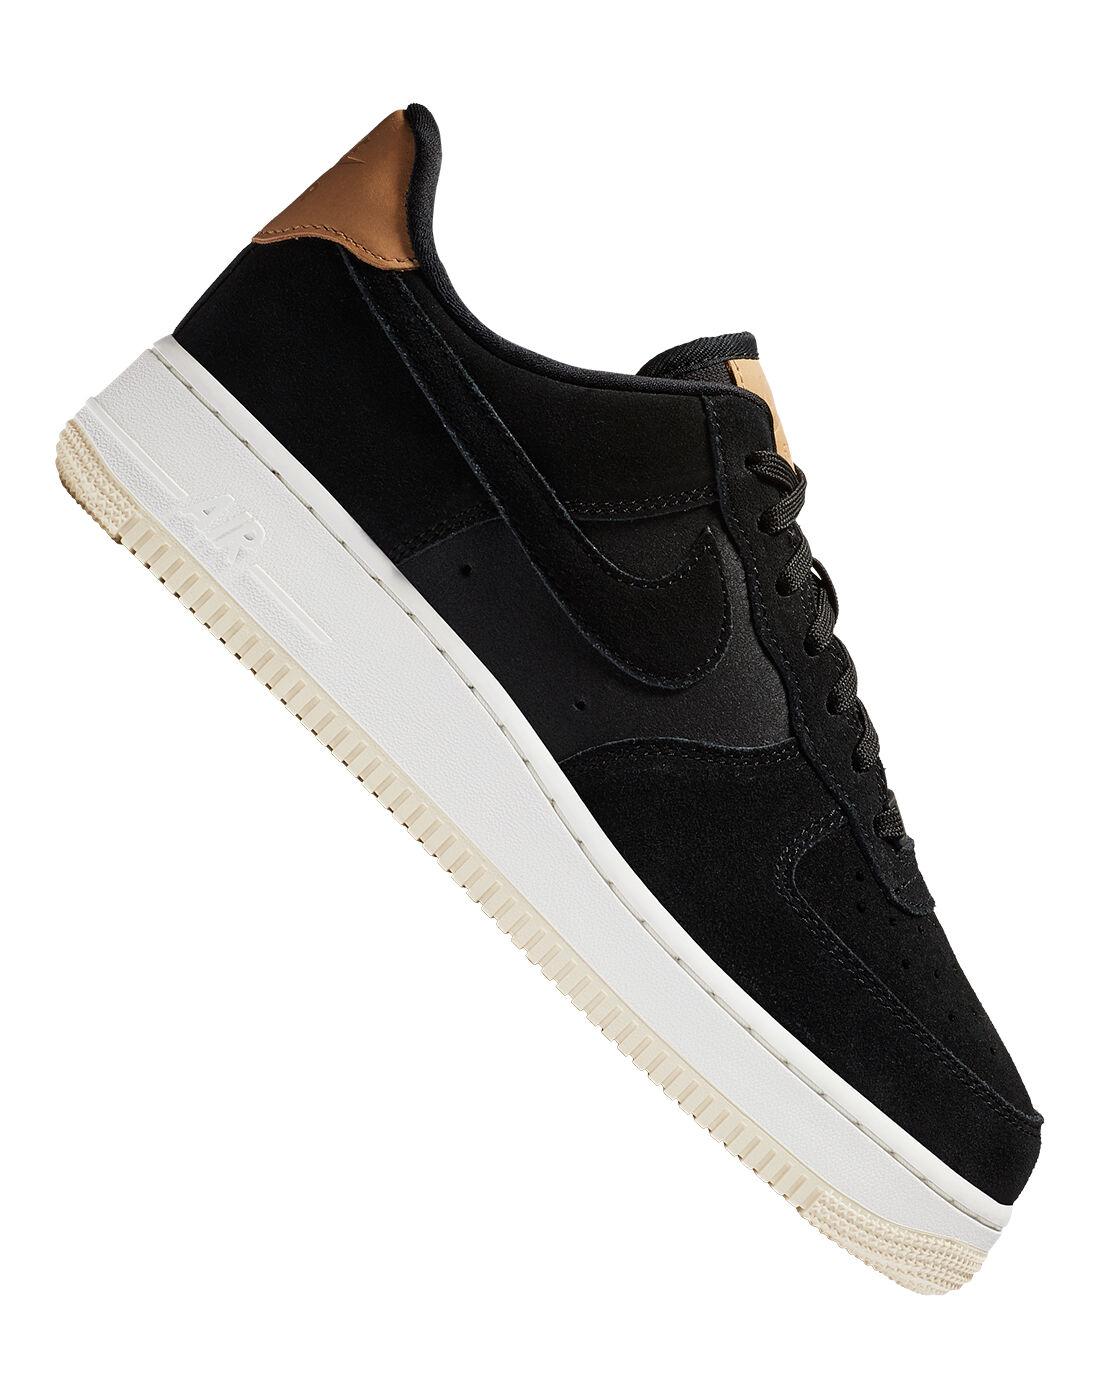 Women's Black Suede Nike Air Force 1